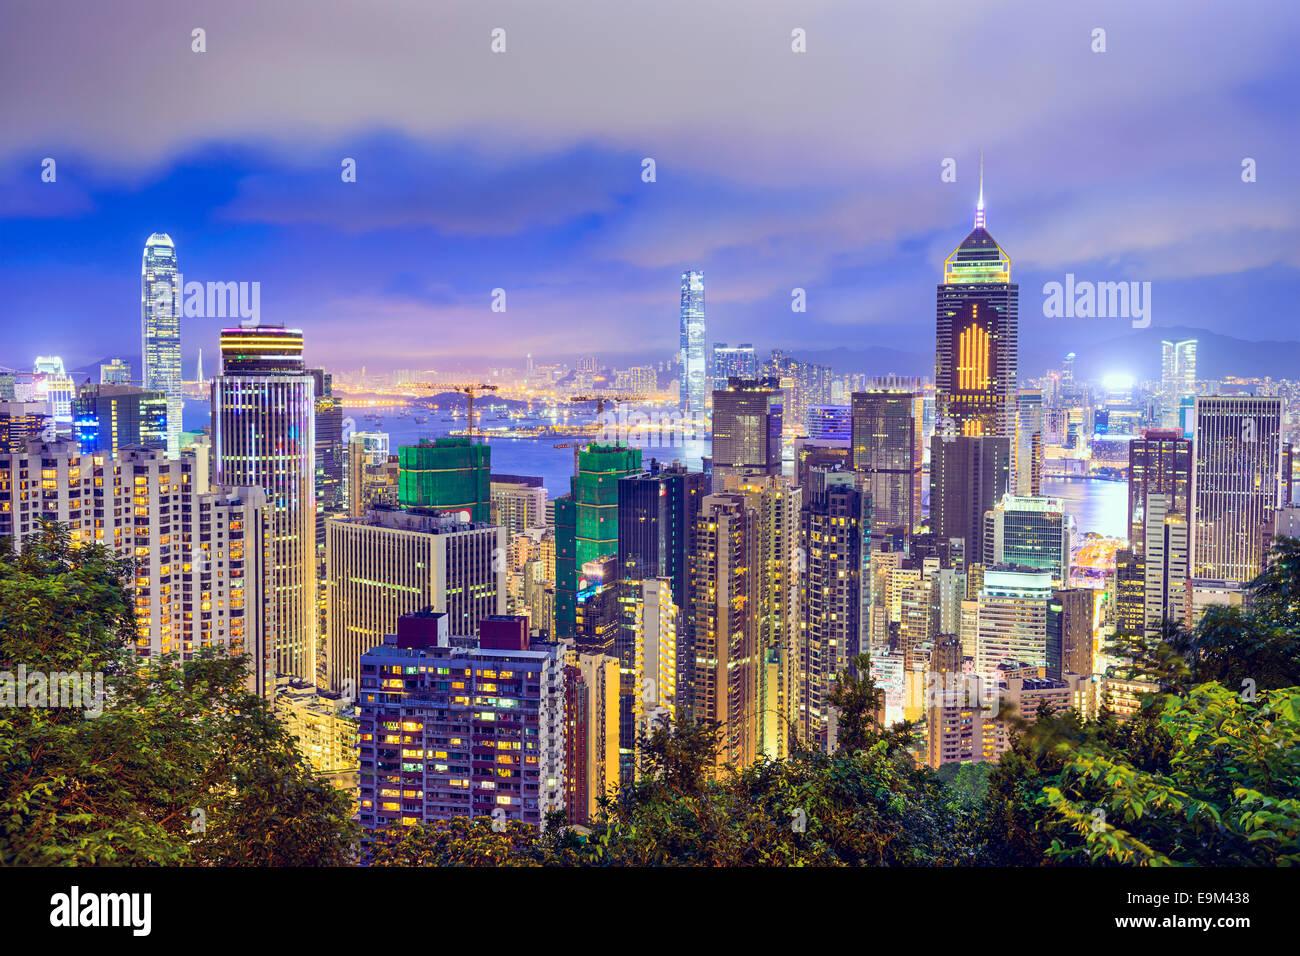 Skyline de Hong Kong, China. Imagen De Stock